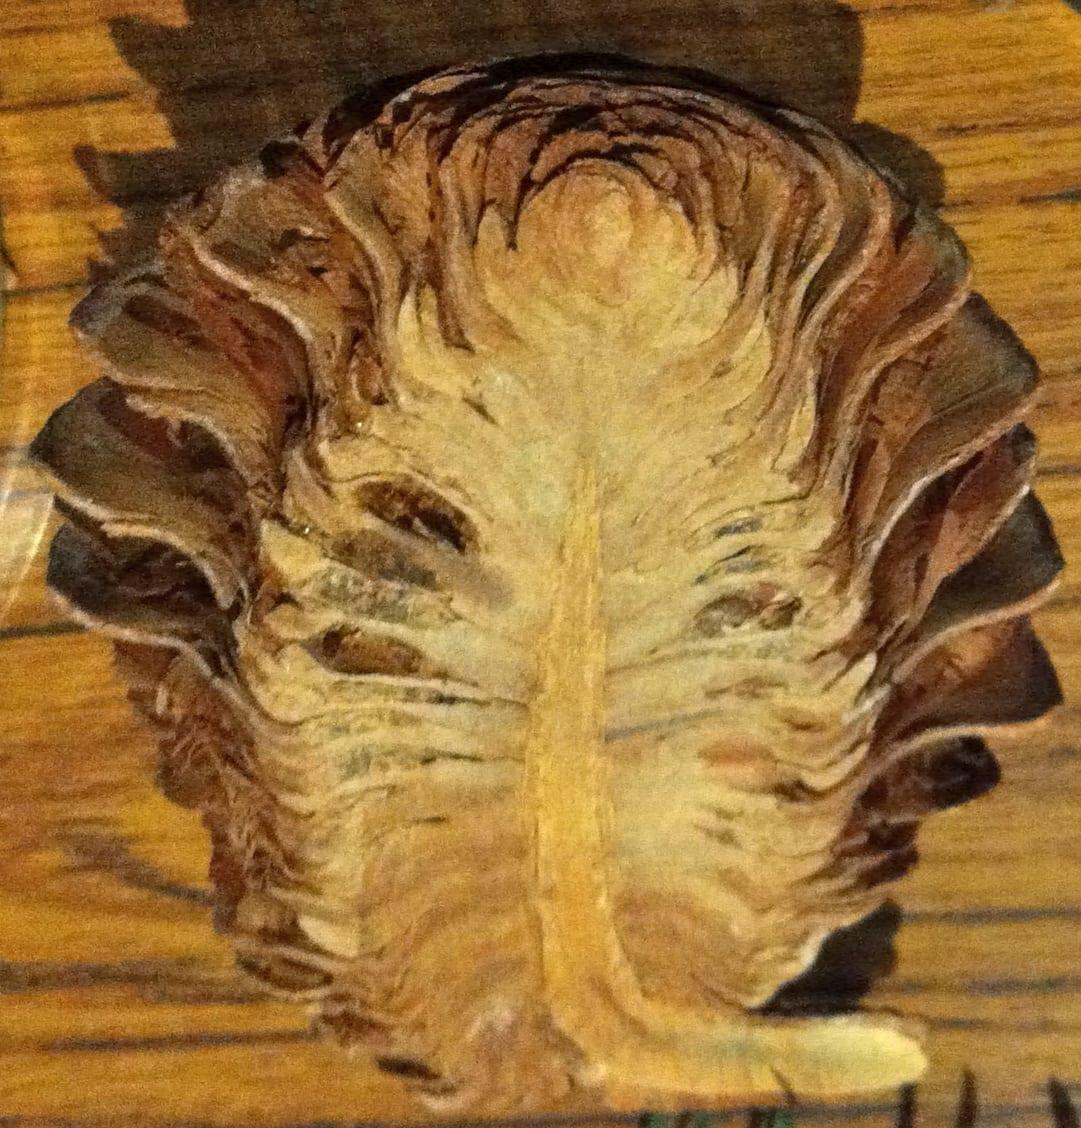 Atlas cedar seed cone section